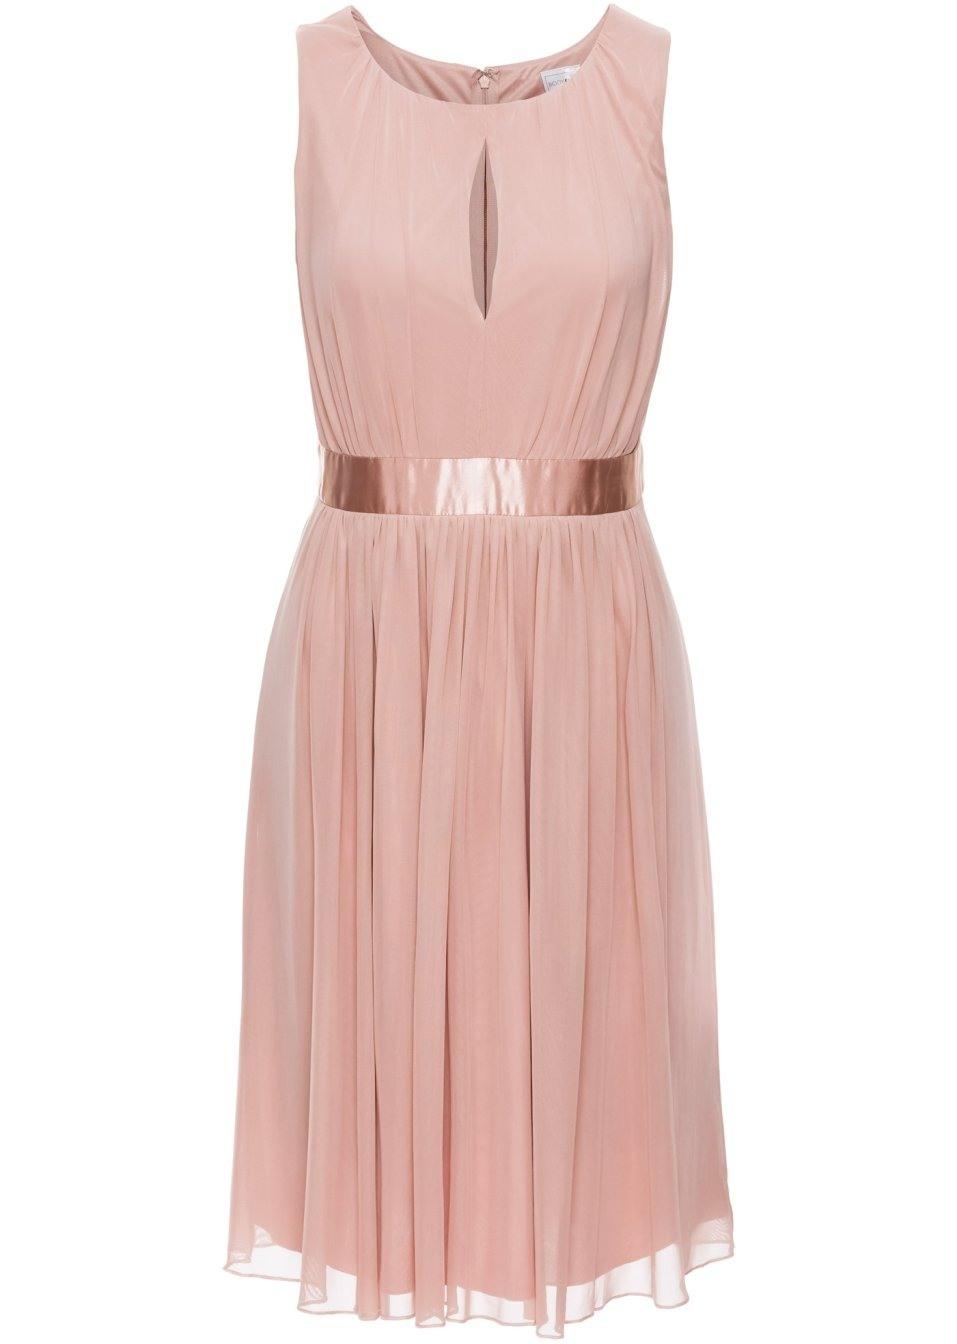 Abend Wunderbar Rosa Kleid Festlich DesignAbend Top Rosa Kleid Festlich Stylish